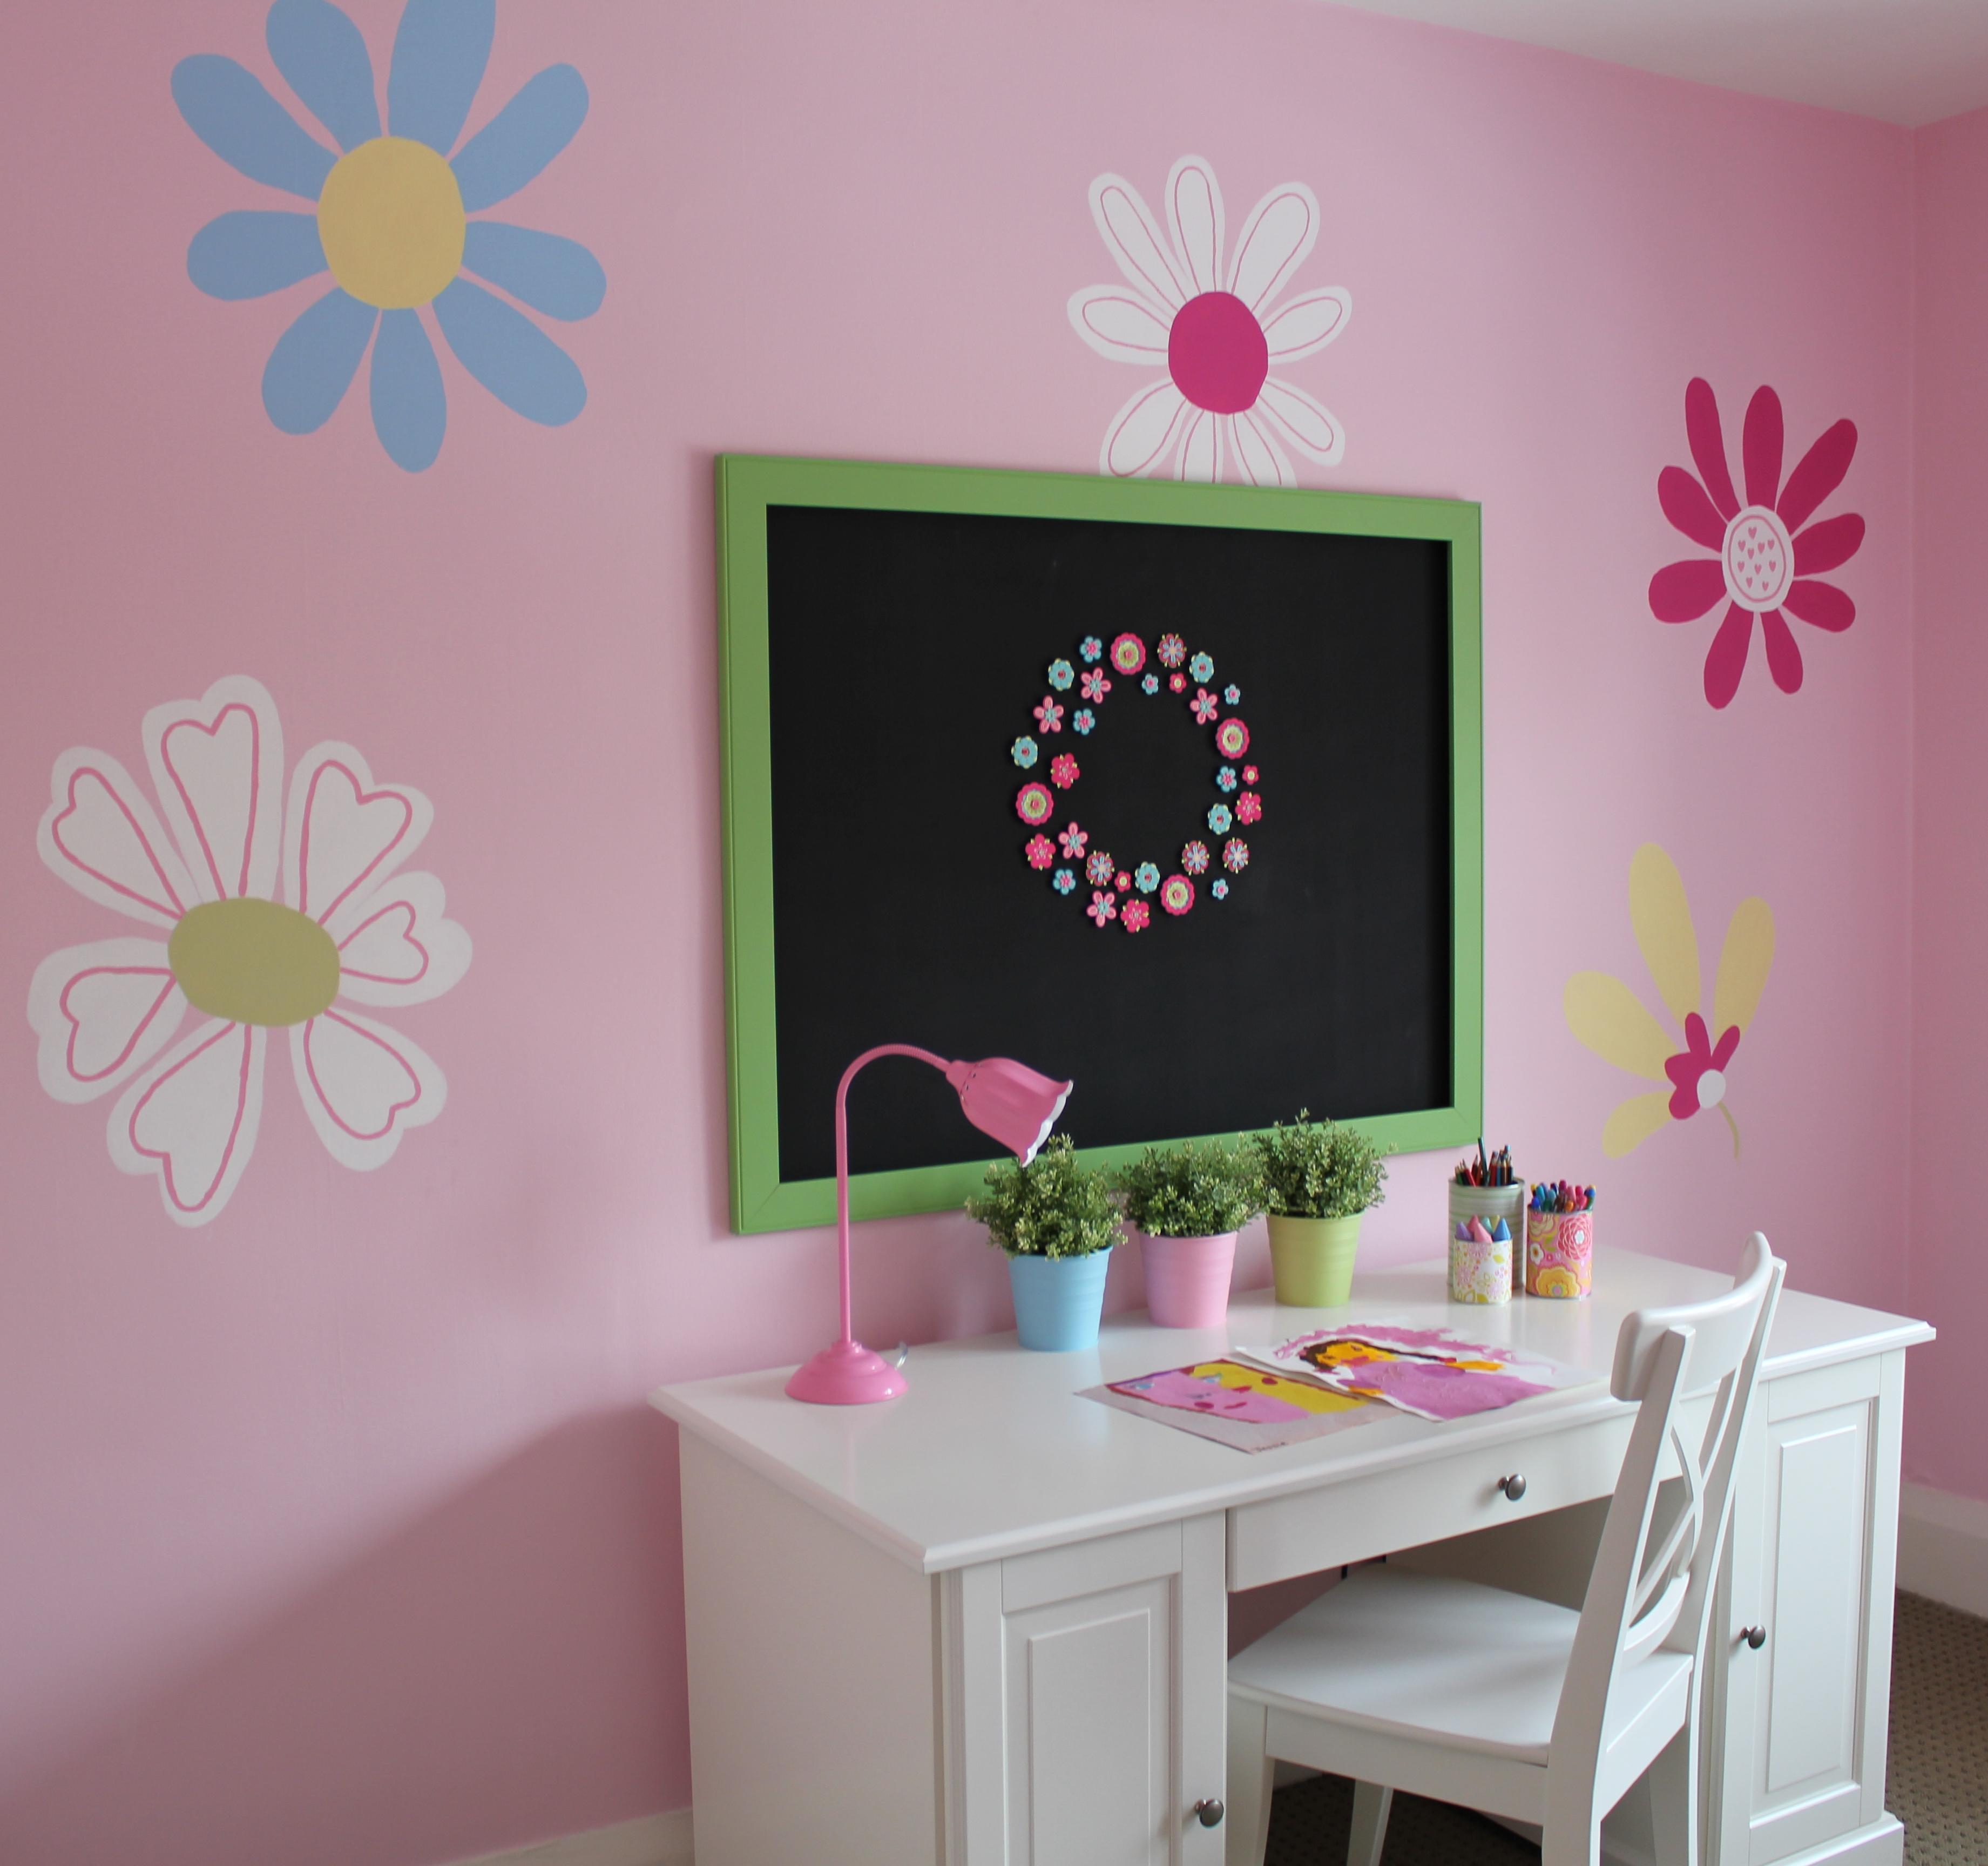 Jessie's Girly Playroom